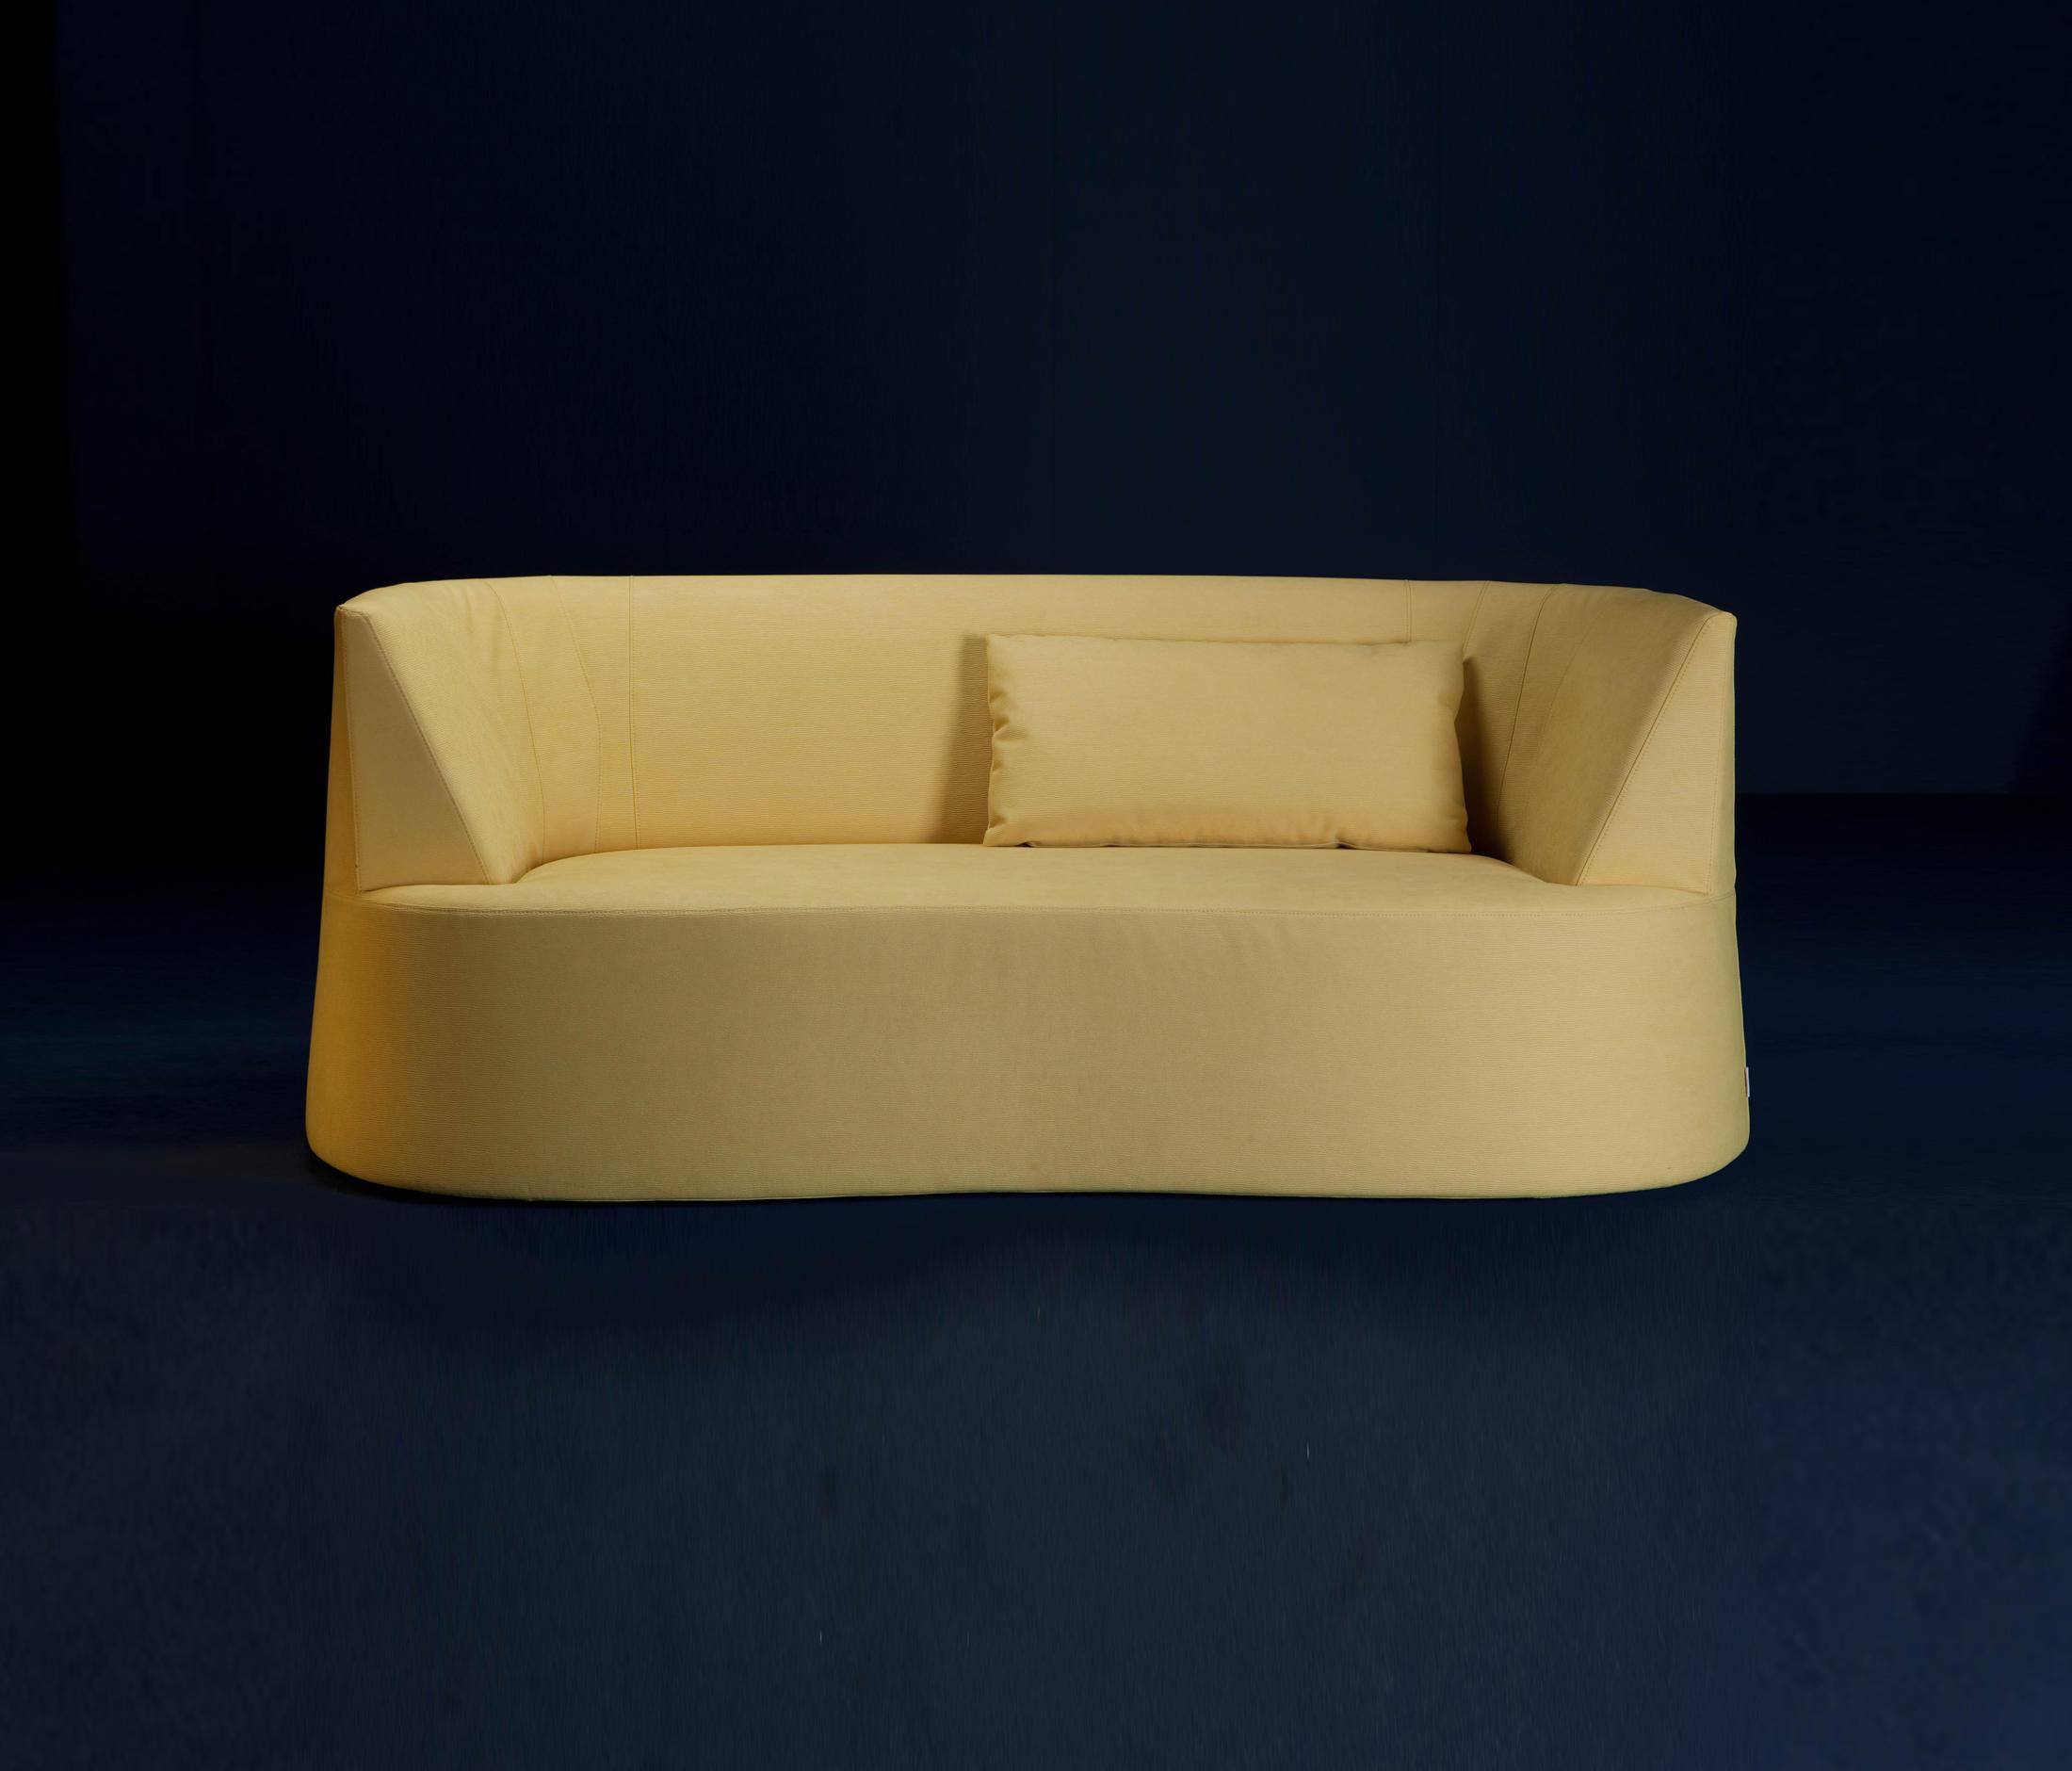 alcantara embossed for powder by kati meyer br hl von alcantara architonic. Black Bedroom Furniture Sets. Home Design Ideas